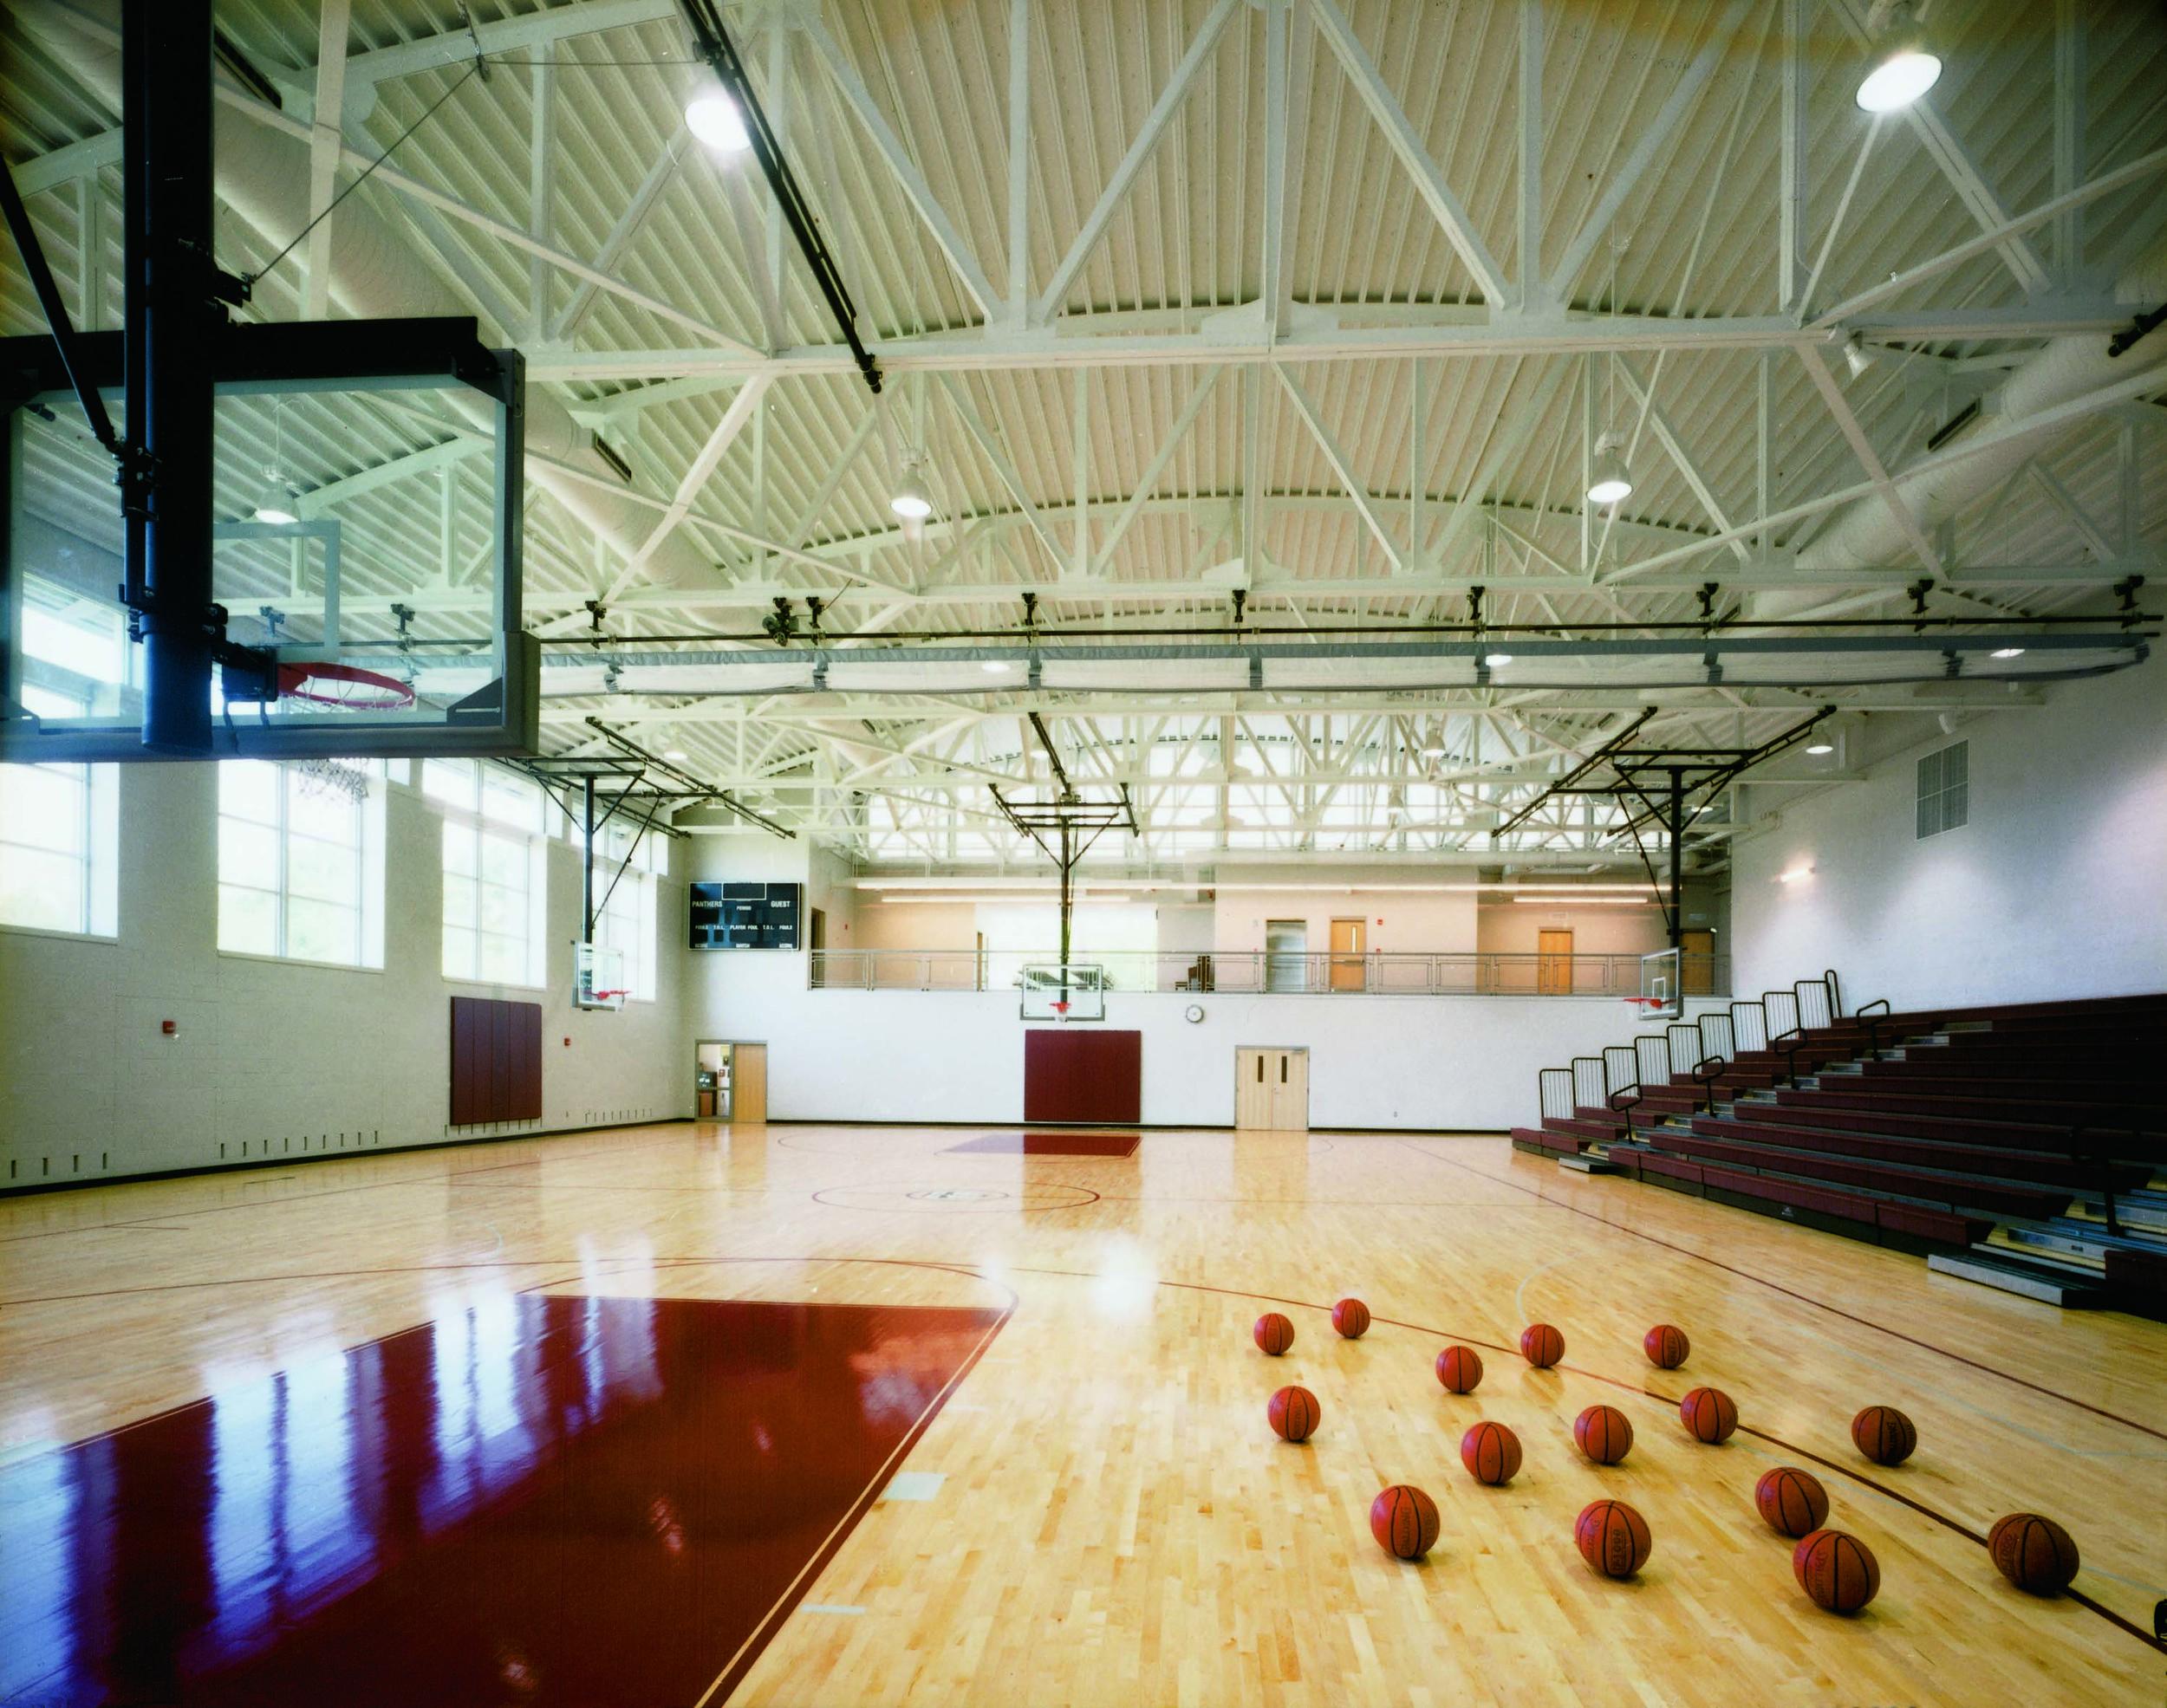 interior gym with balls.jpg